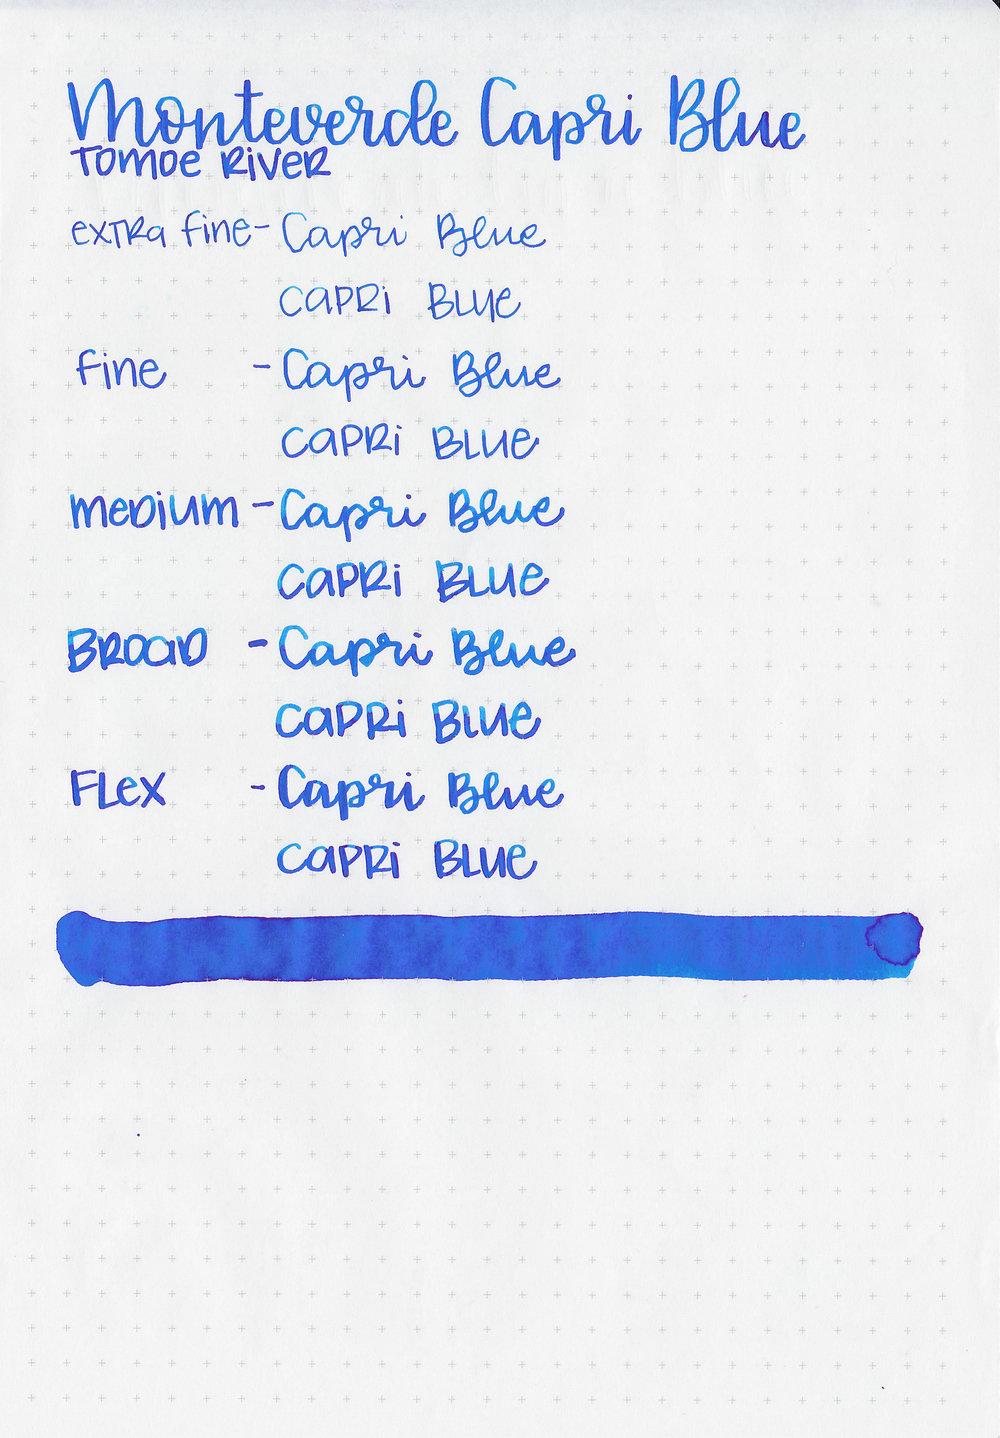 mv-capri-blue-8.jpg